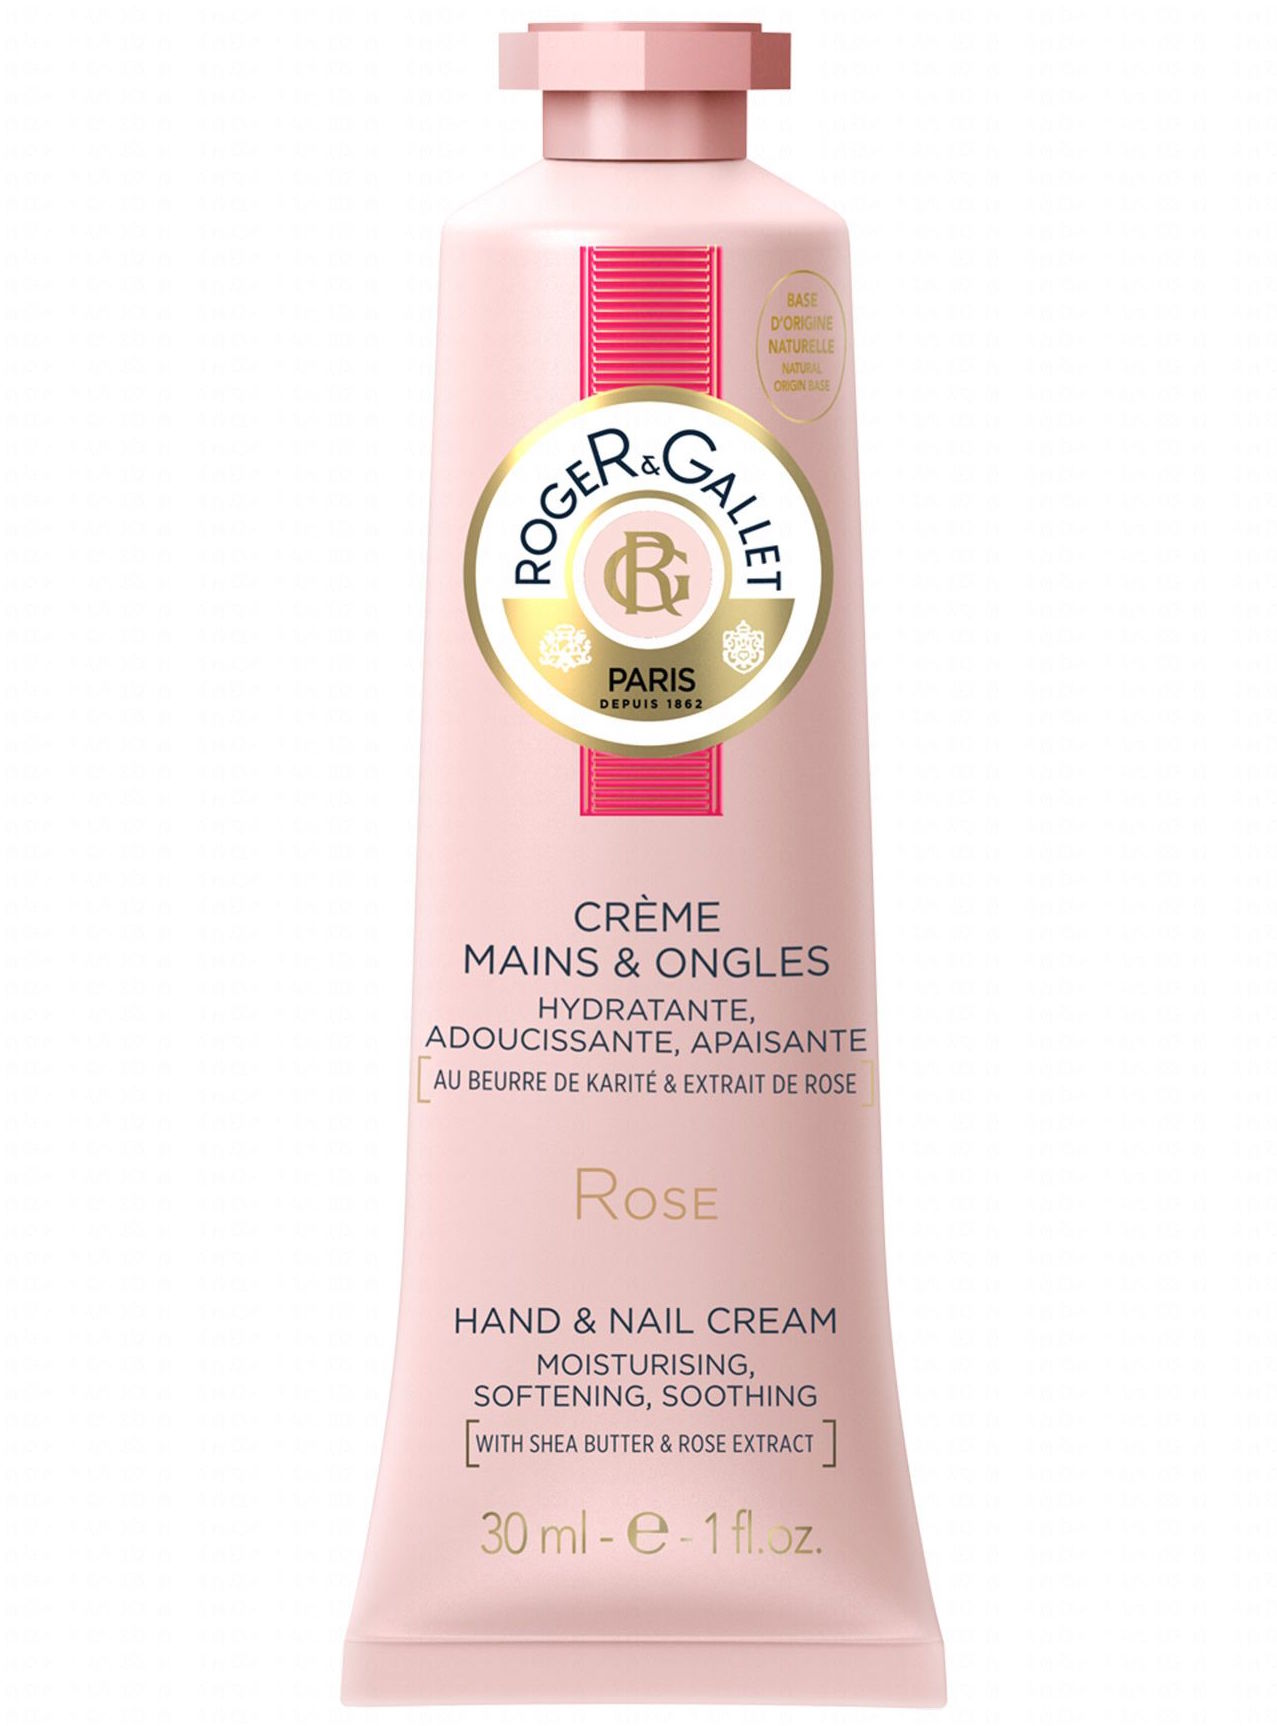 ROGER-GALLET-Creme-Mains-Ongles-a-la-Rose-tube-30ml-22396_2_1461774000